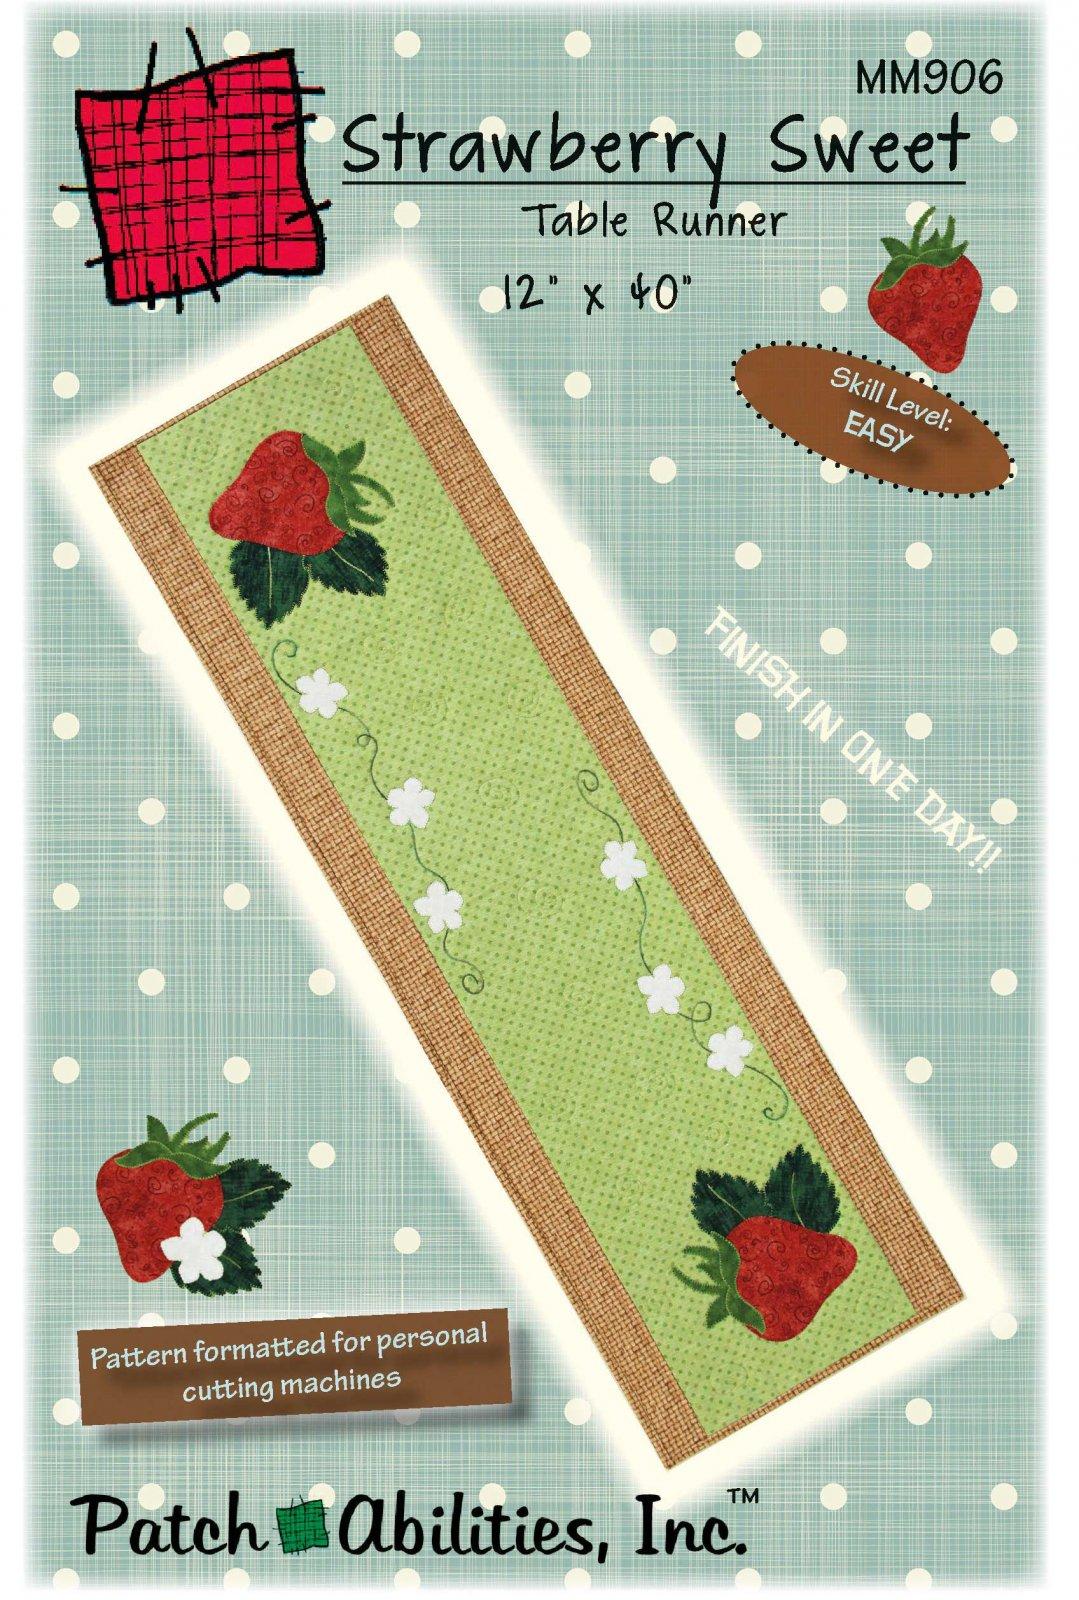 MM906 Strawberry Sweet